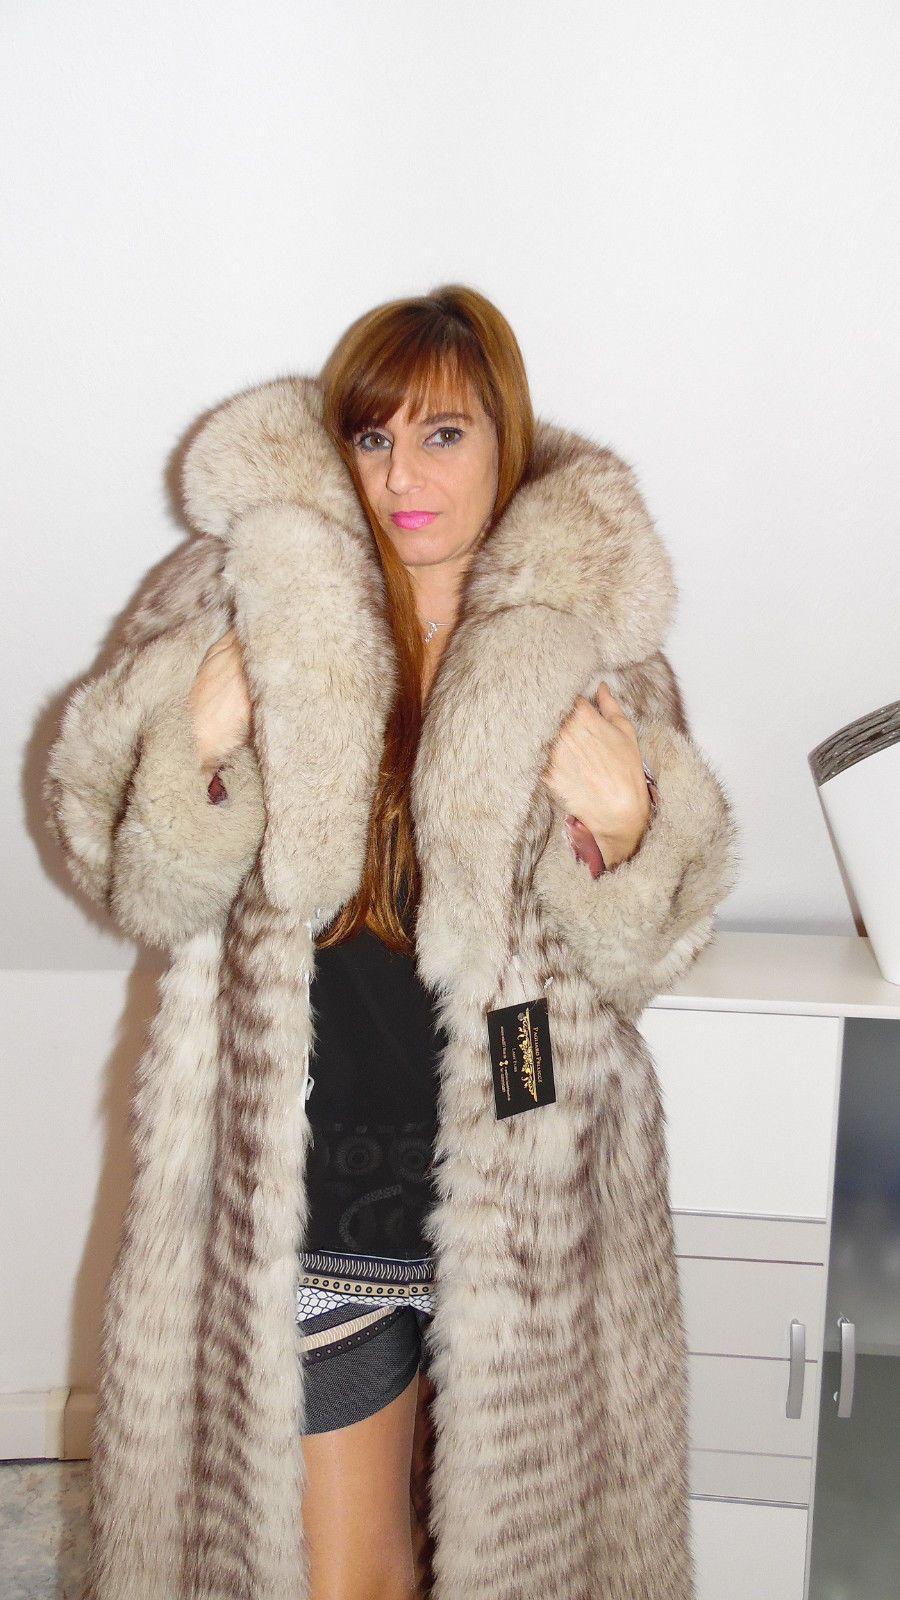 Fox Coat Päls Fuchsjacke Pelzmantel Polar Silver Pelz Fur qUzVMSp